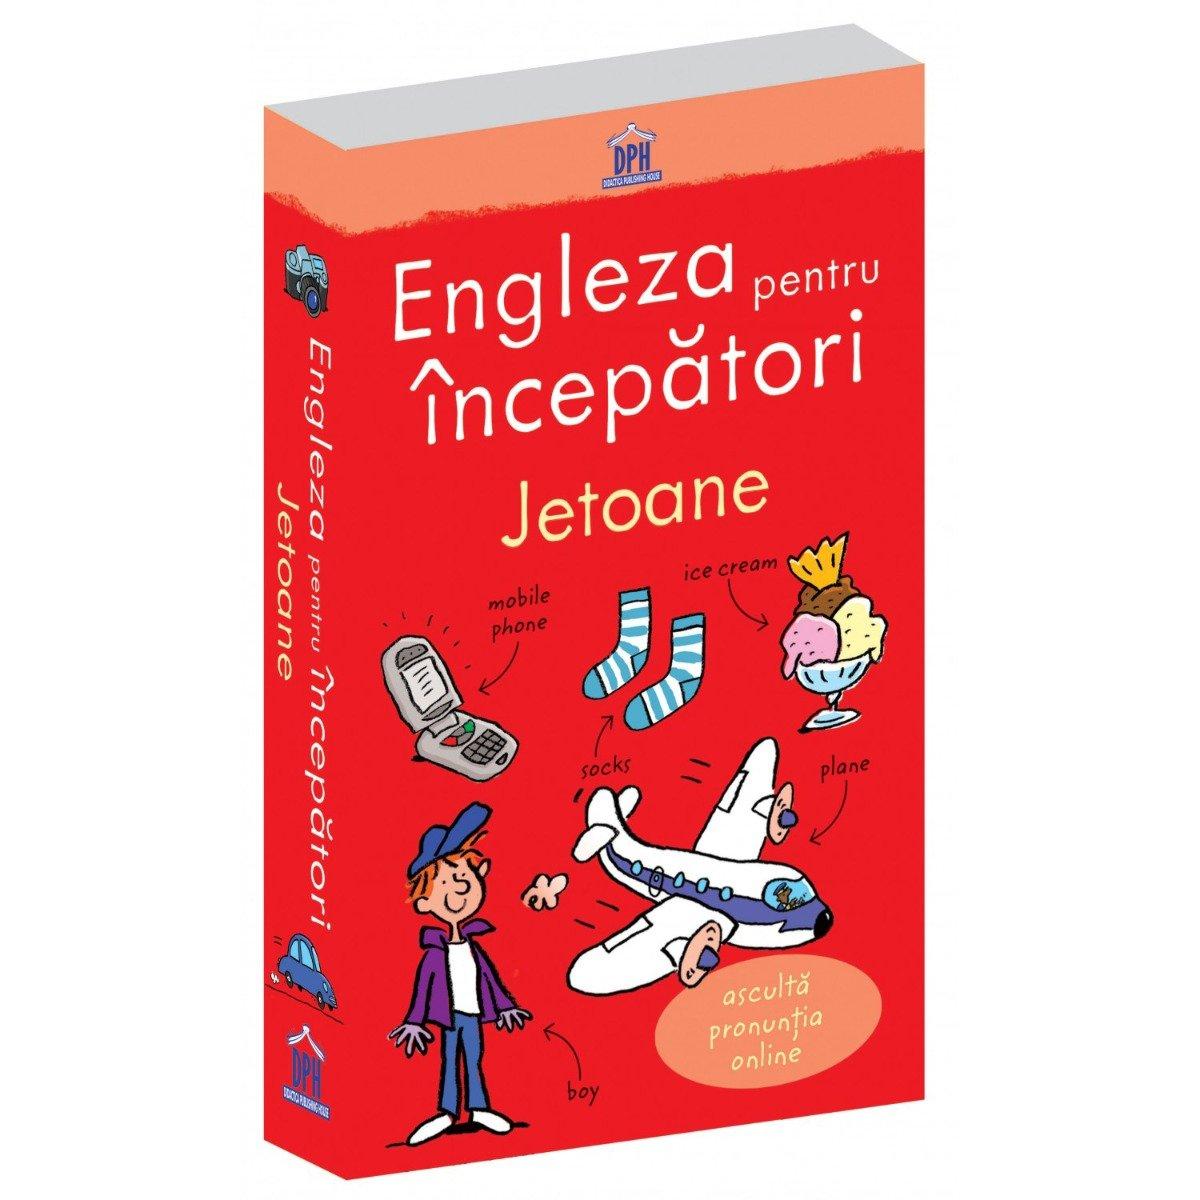 Jetoane Engleza pentru incepatori - format nou, Editura DPH